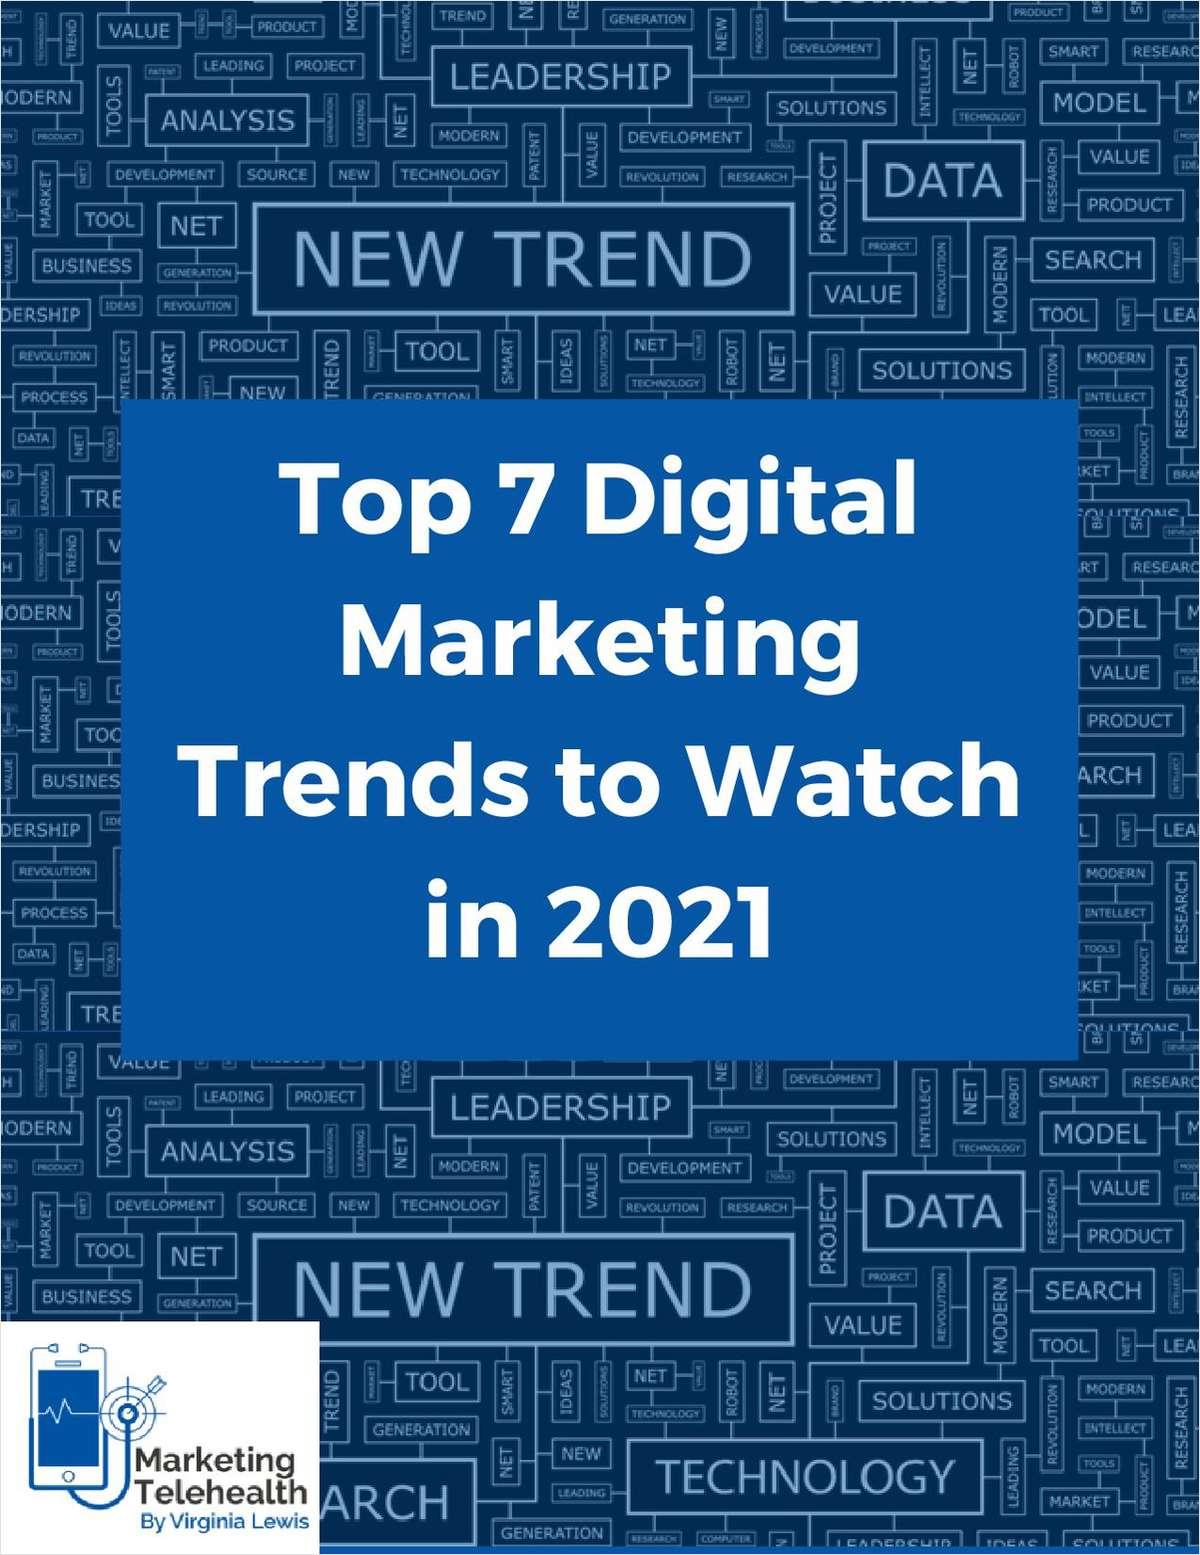 Top 7 Digital Marketing Trends to Watch in 2021